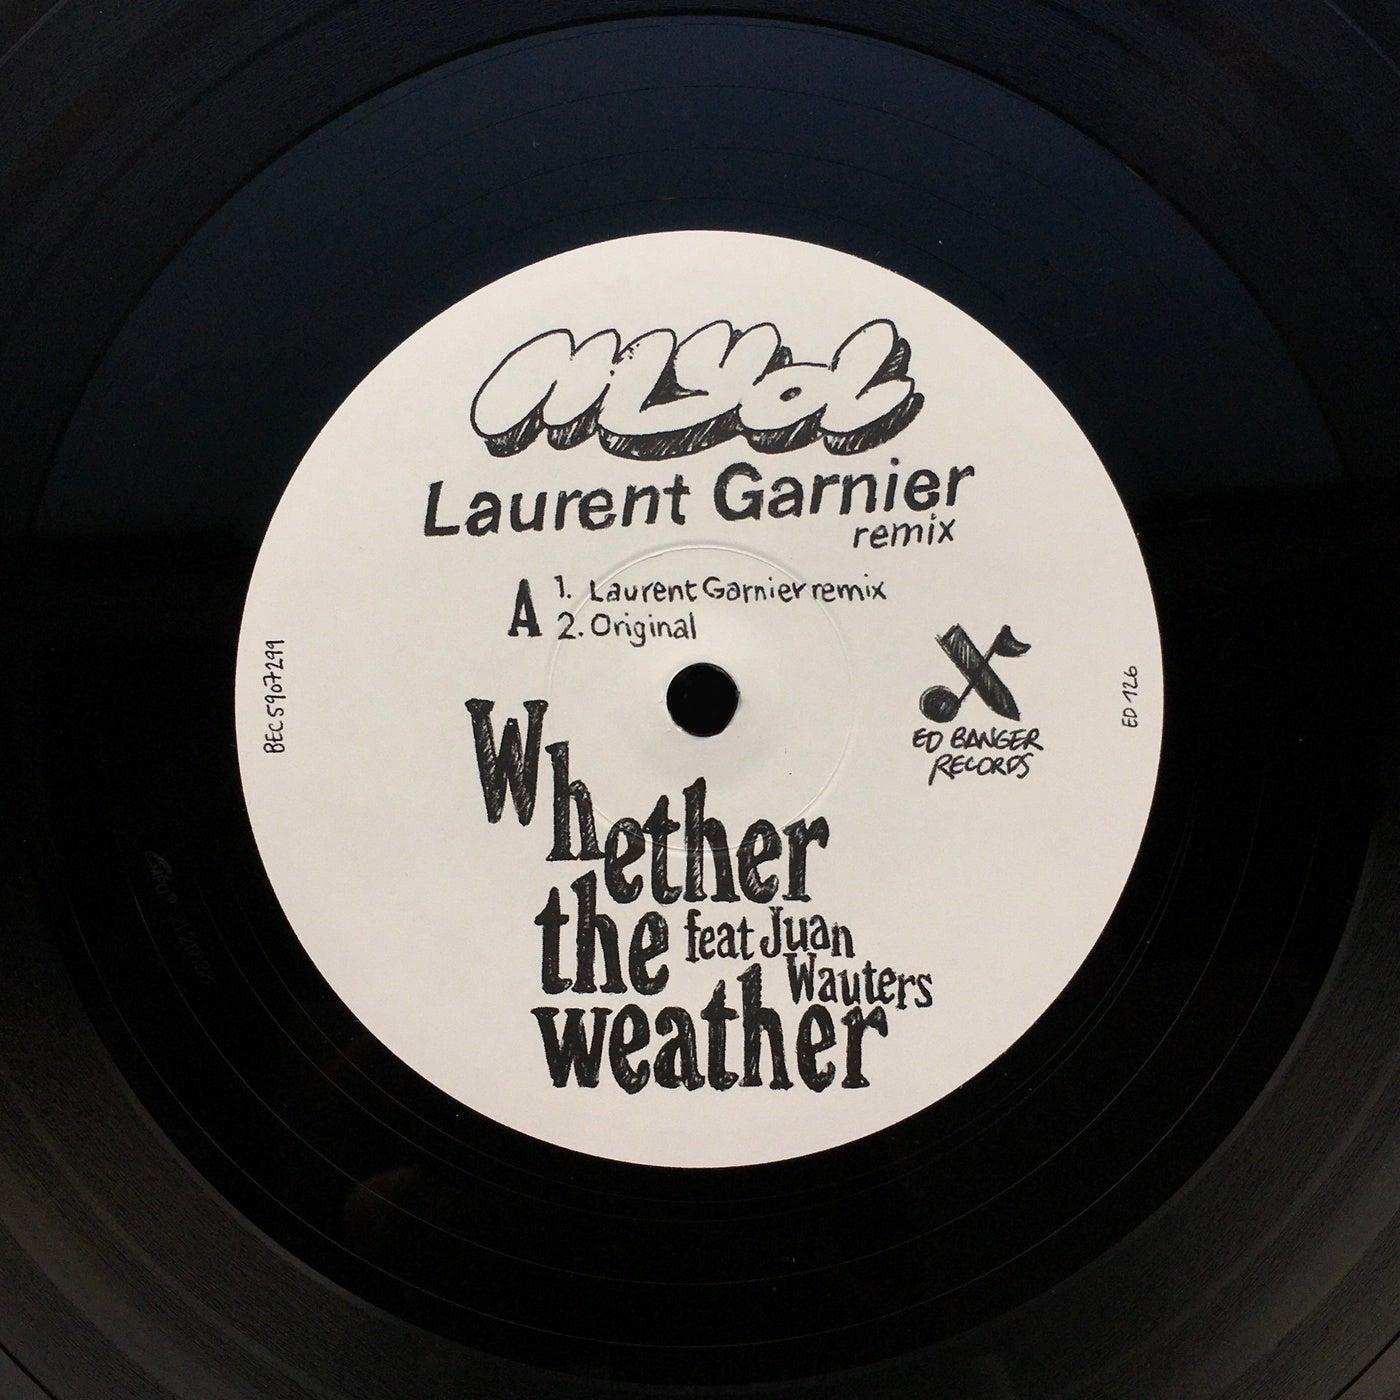 Whether the Weather (feat. Juan Wauters) (Laurent Garnier Remix)